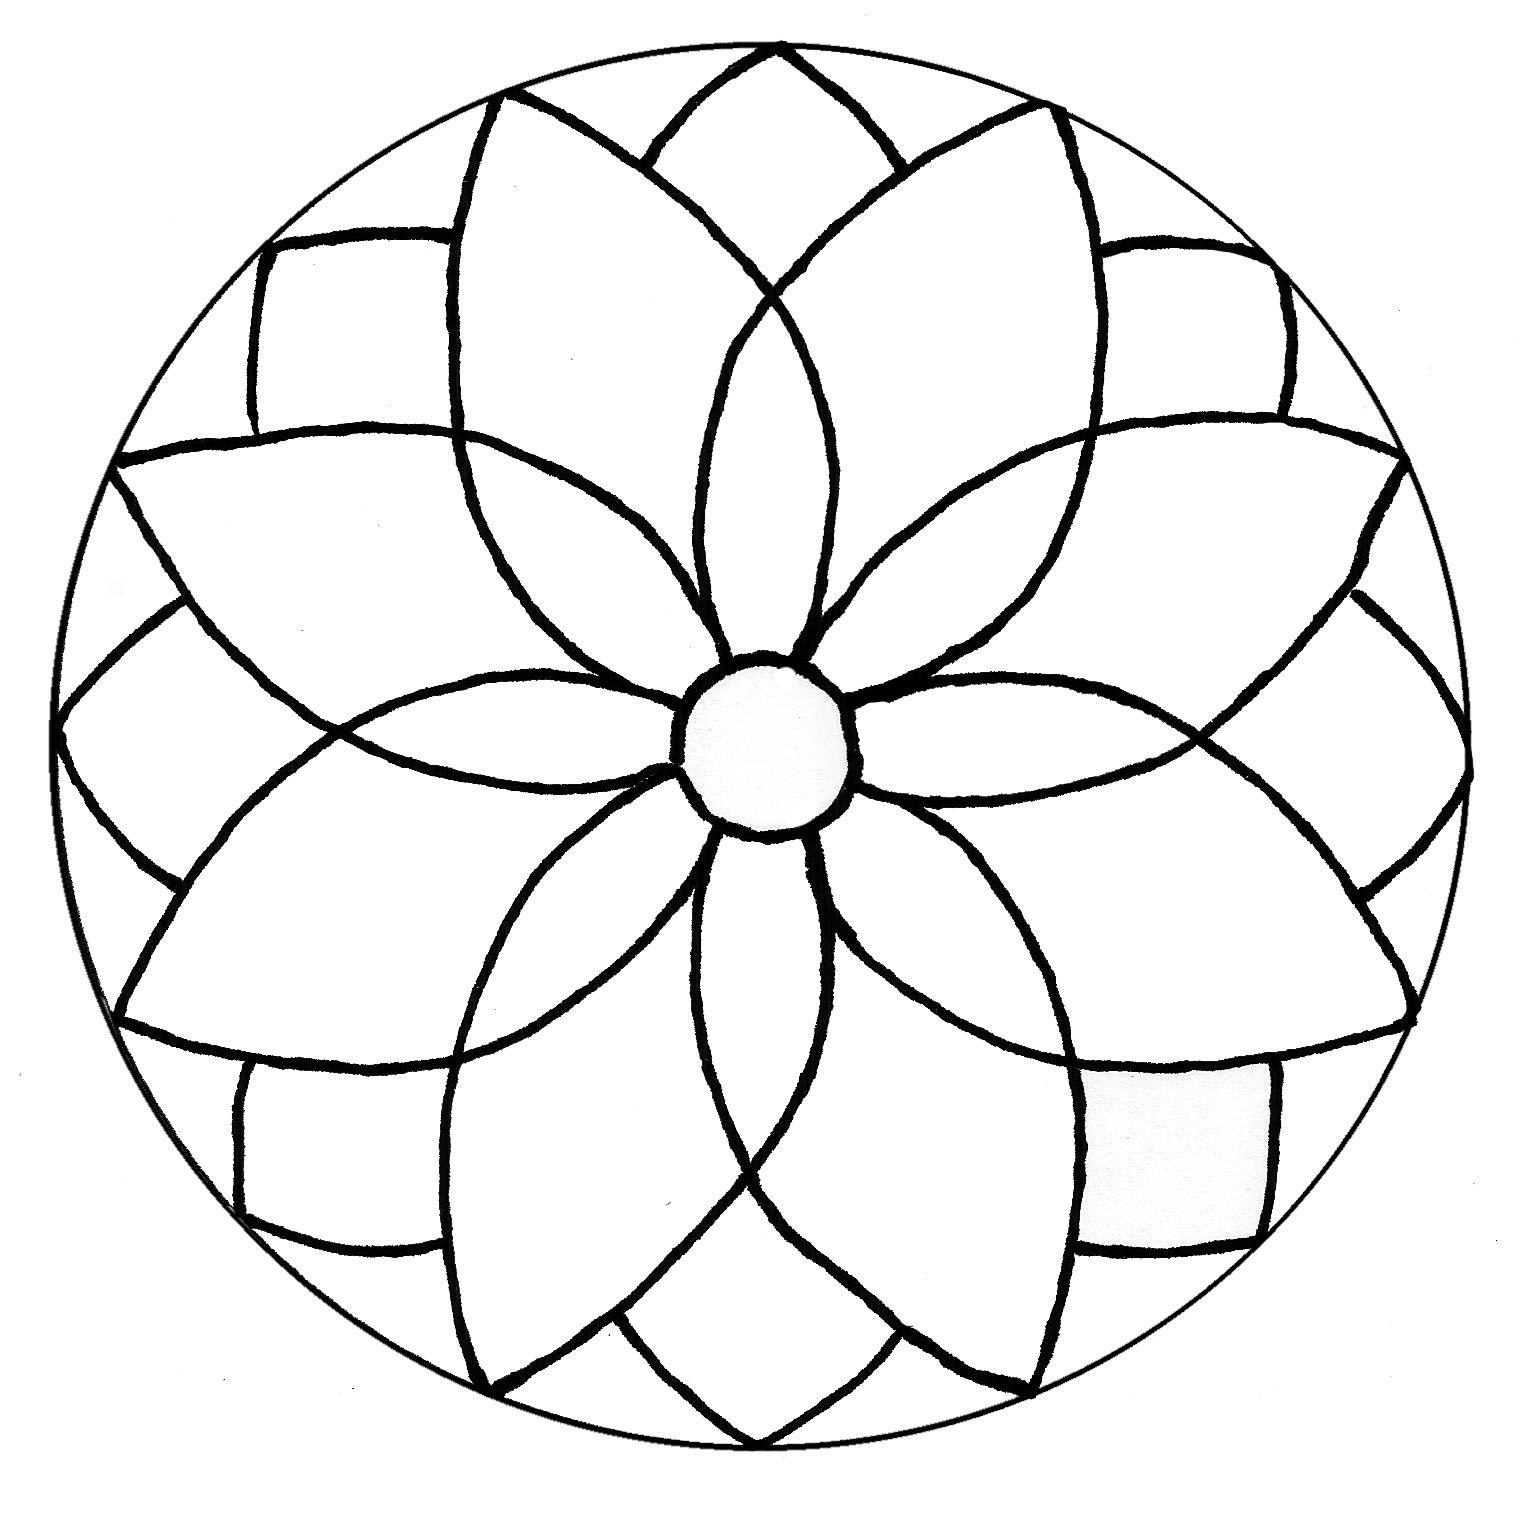 mandalas de vidro passo a passo  Googleda Ara  Mandala